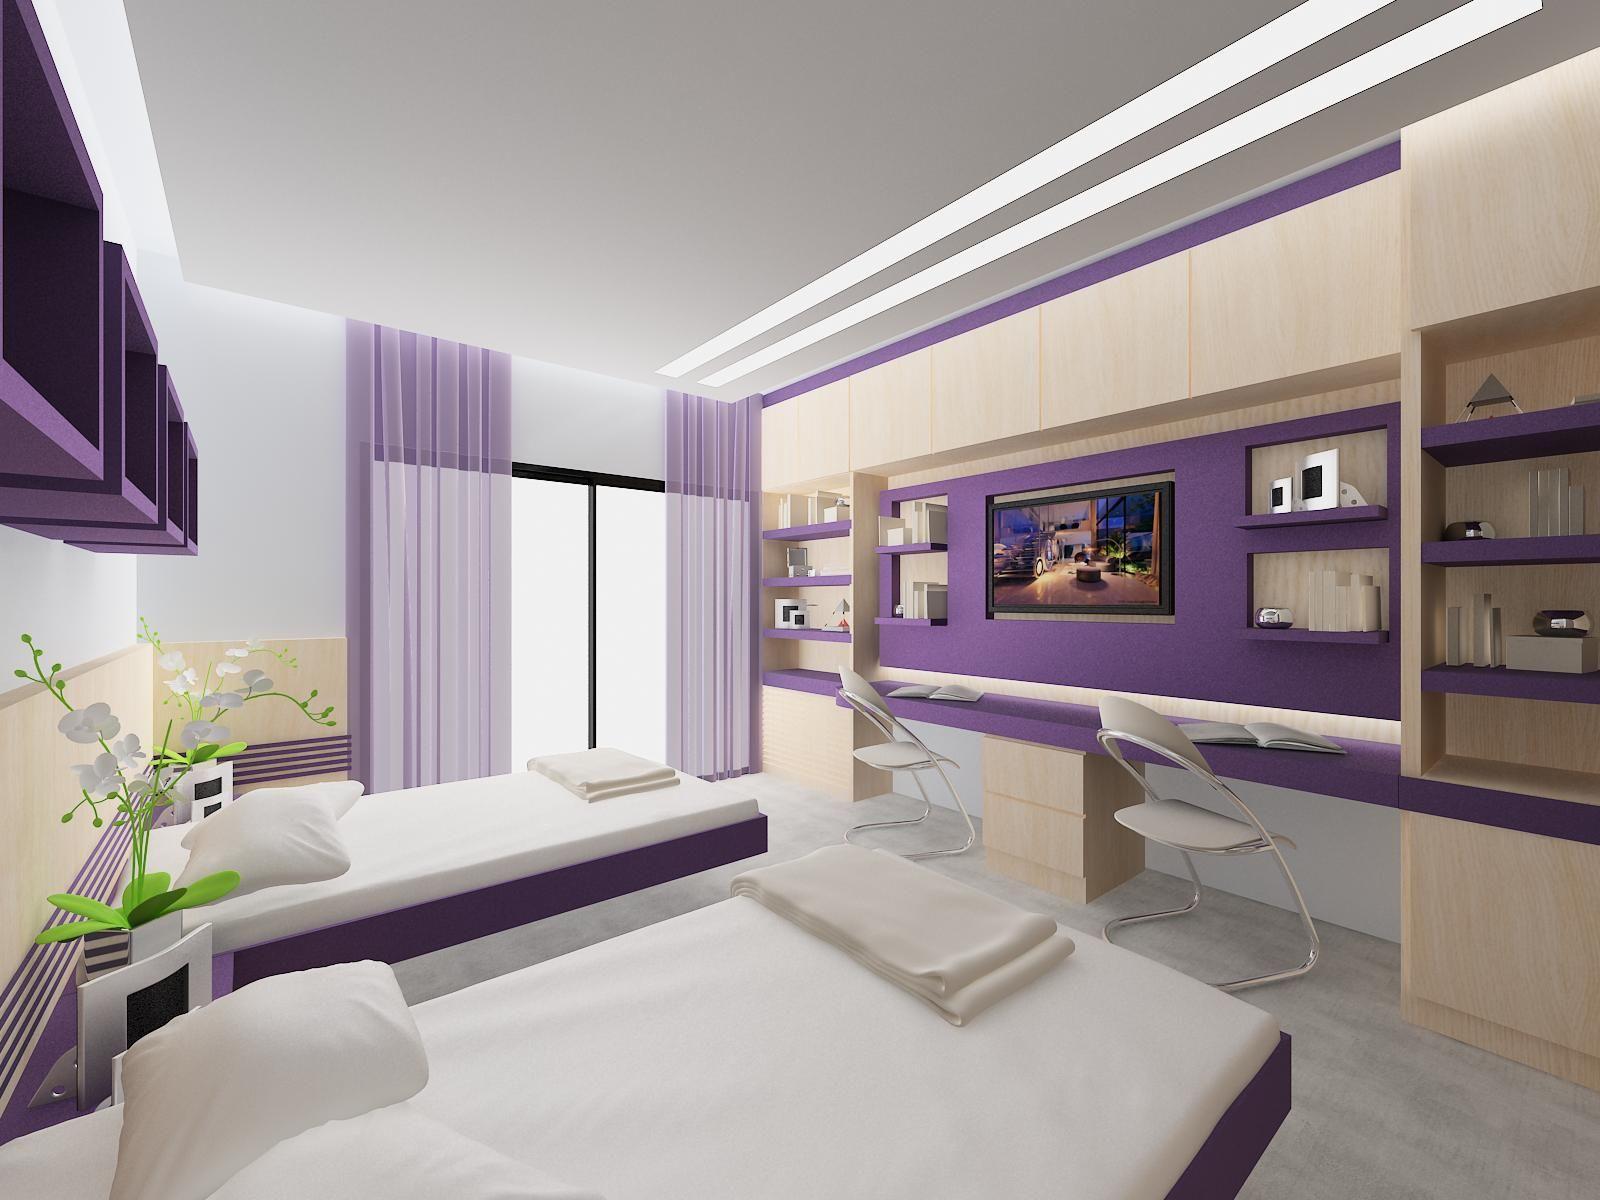 wonderful false ceiling lights for teen girls bedroom